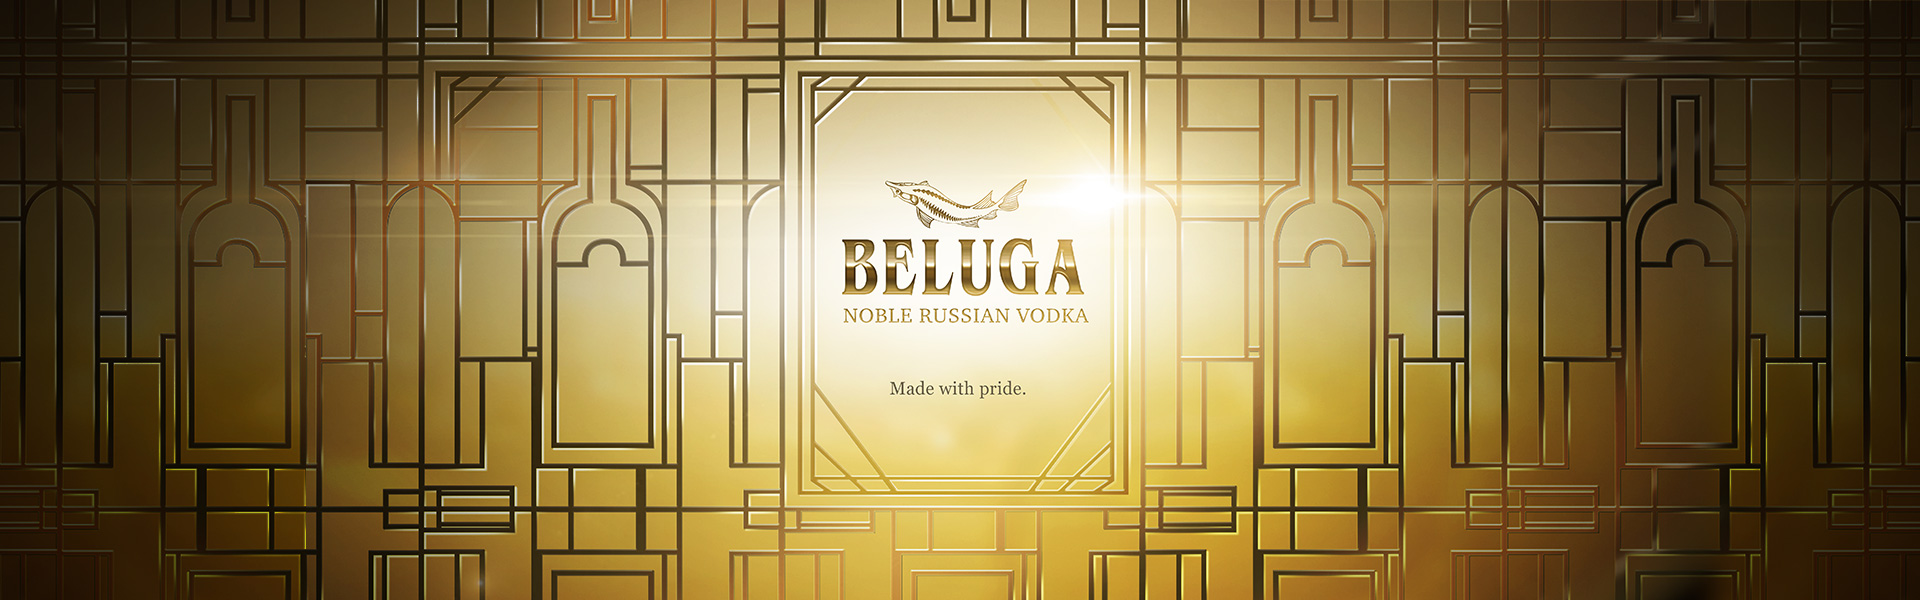 slider_beluga-2